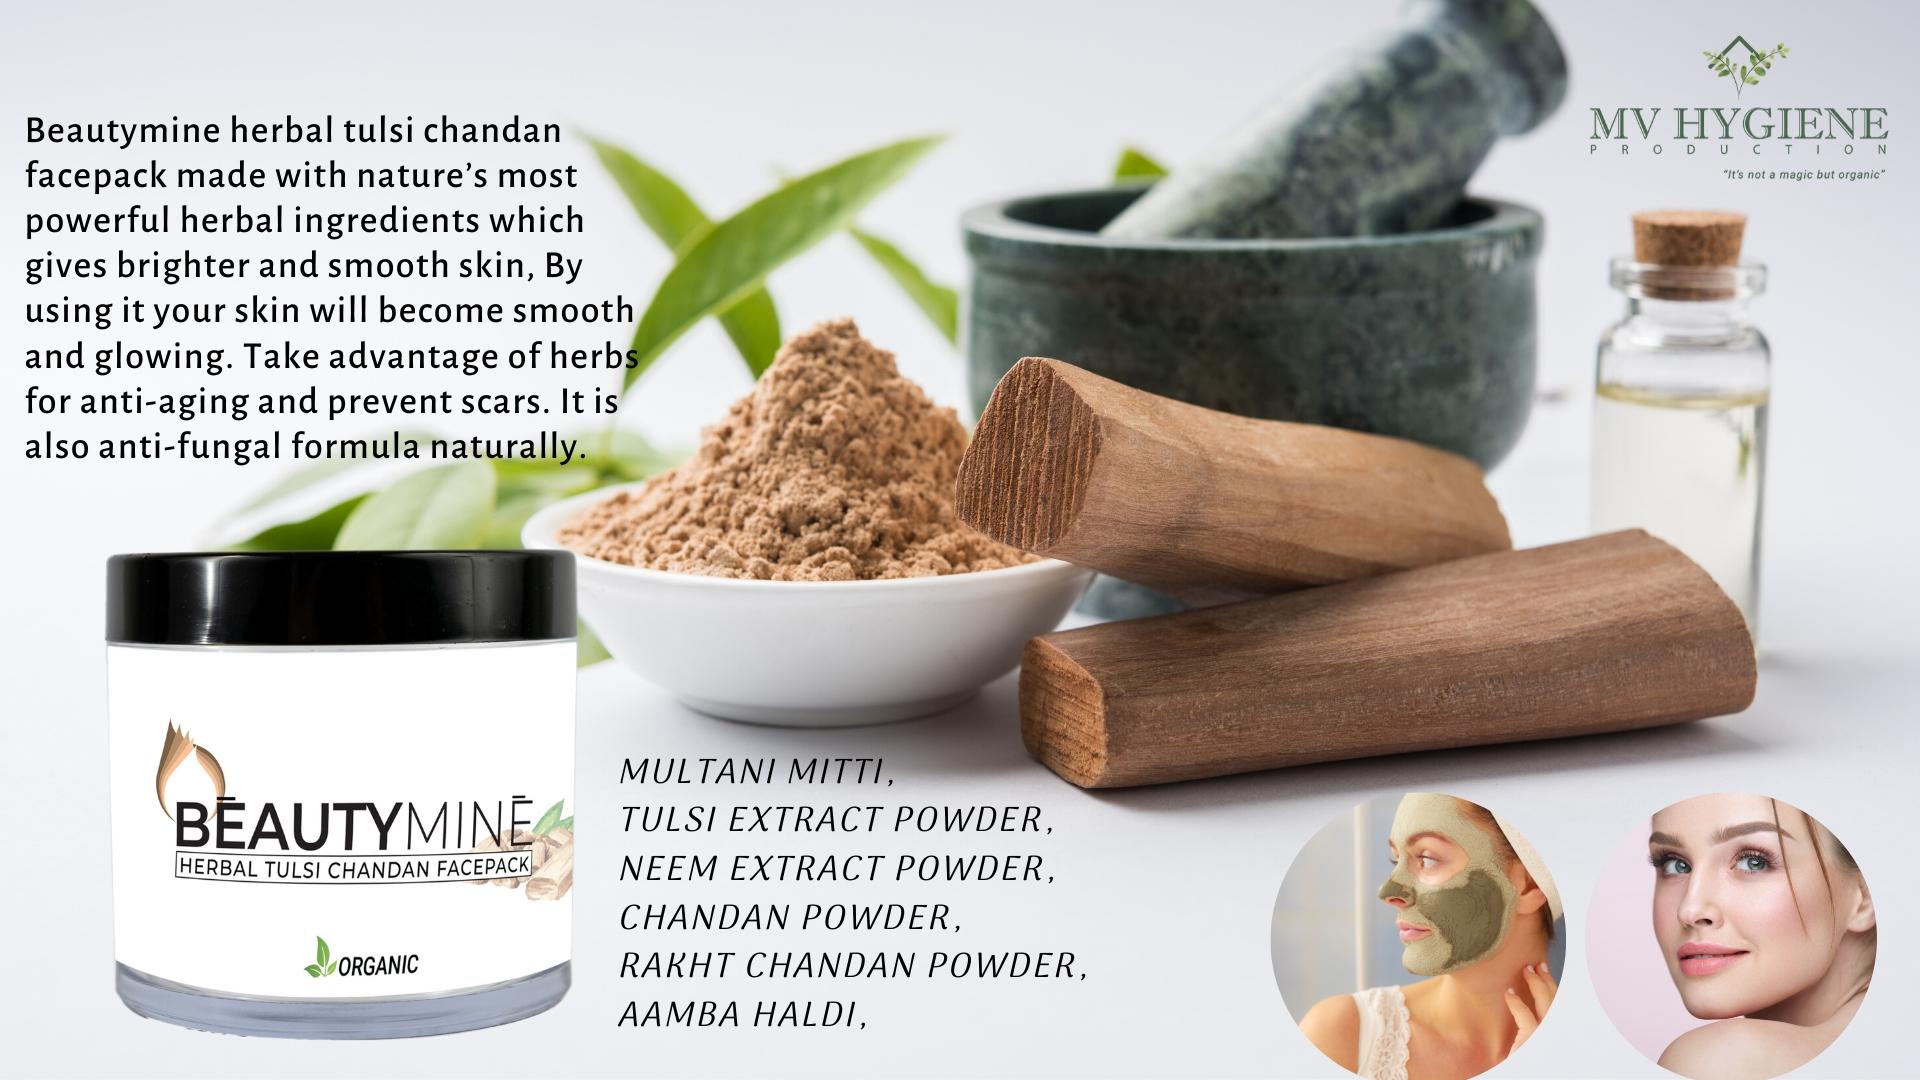 Beautymine Herbal Tulsi Chandan Face Pack